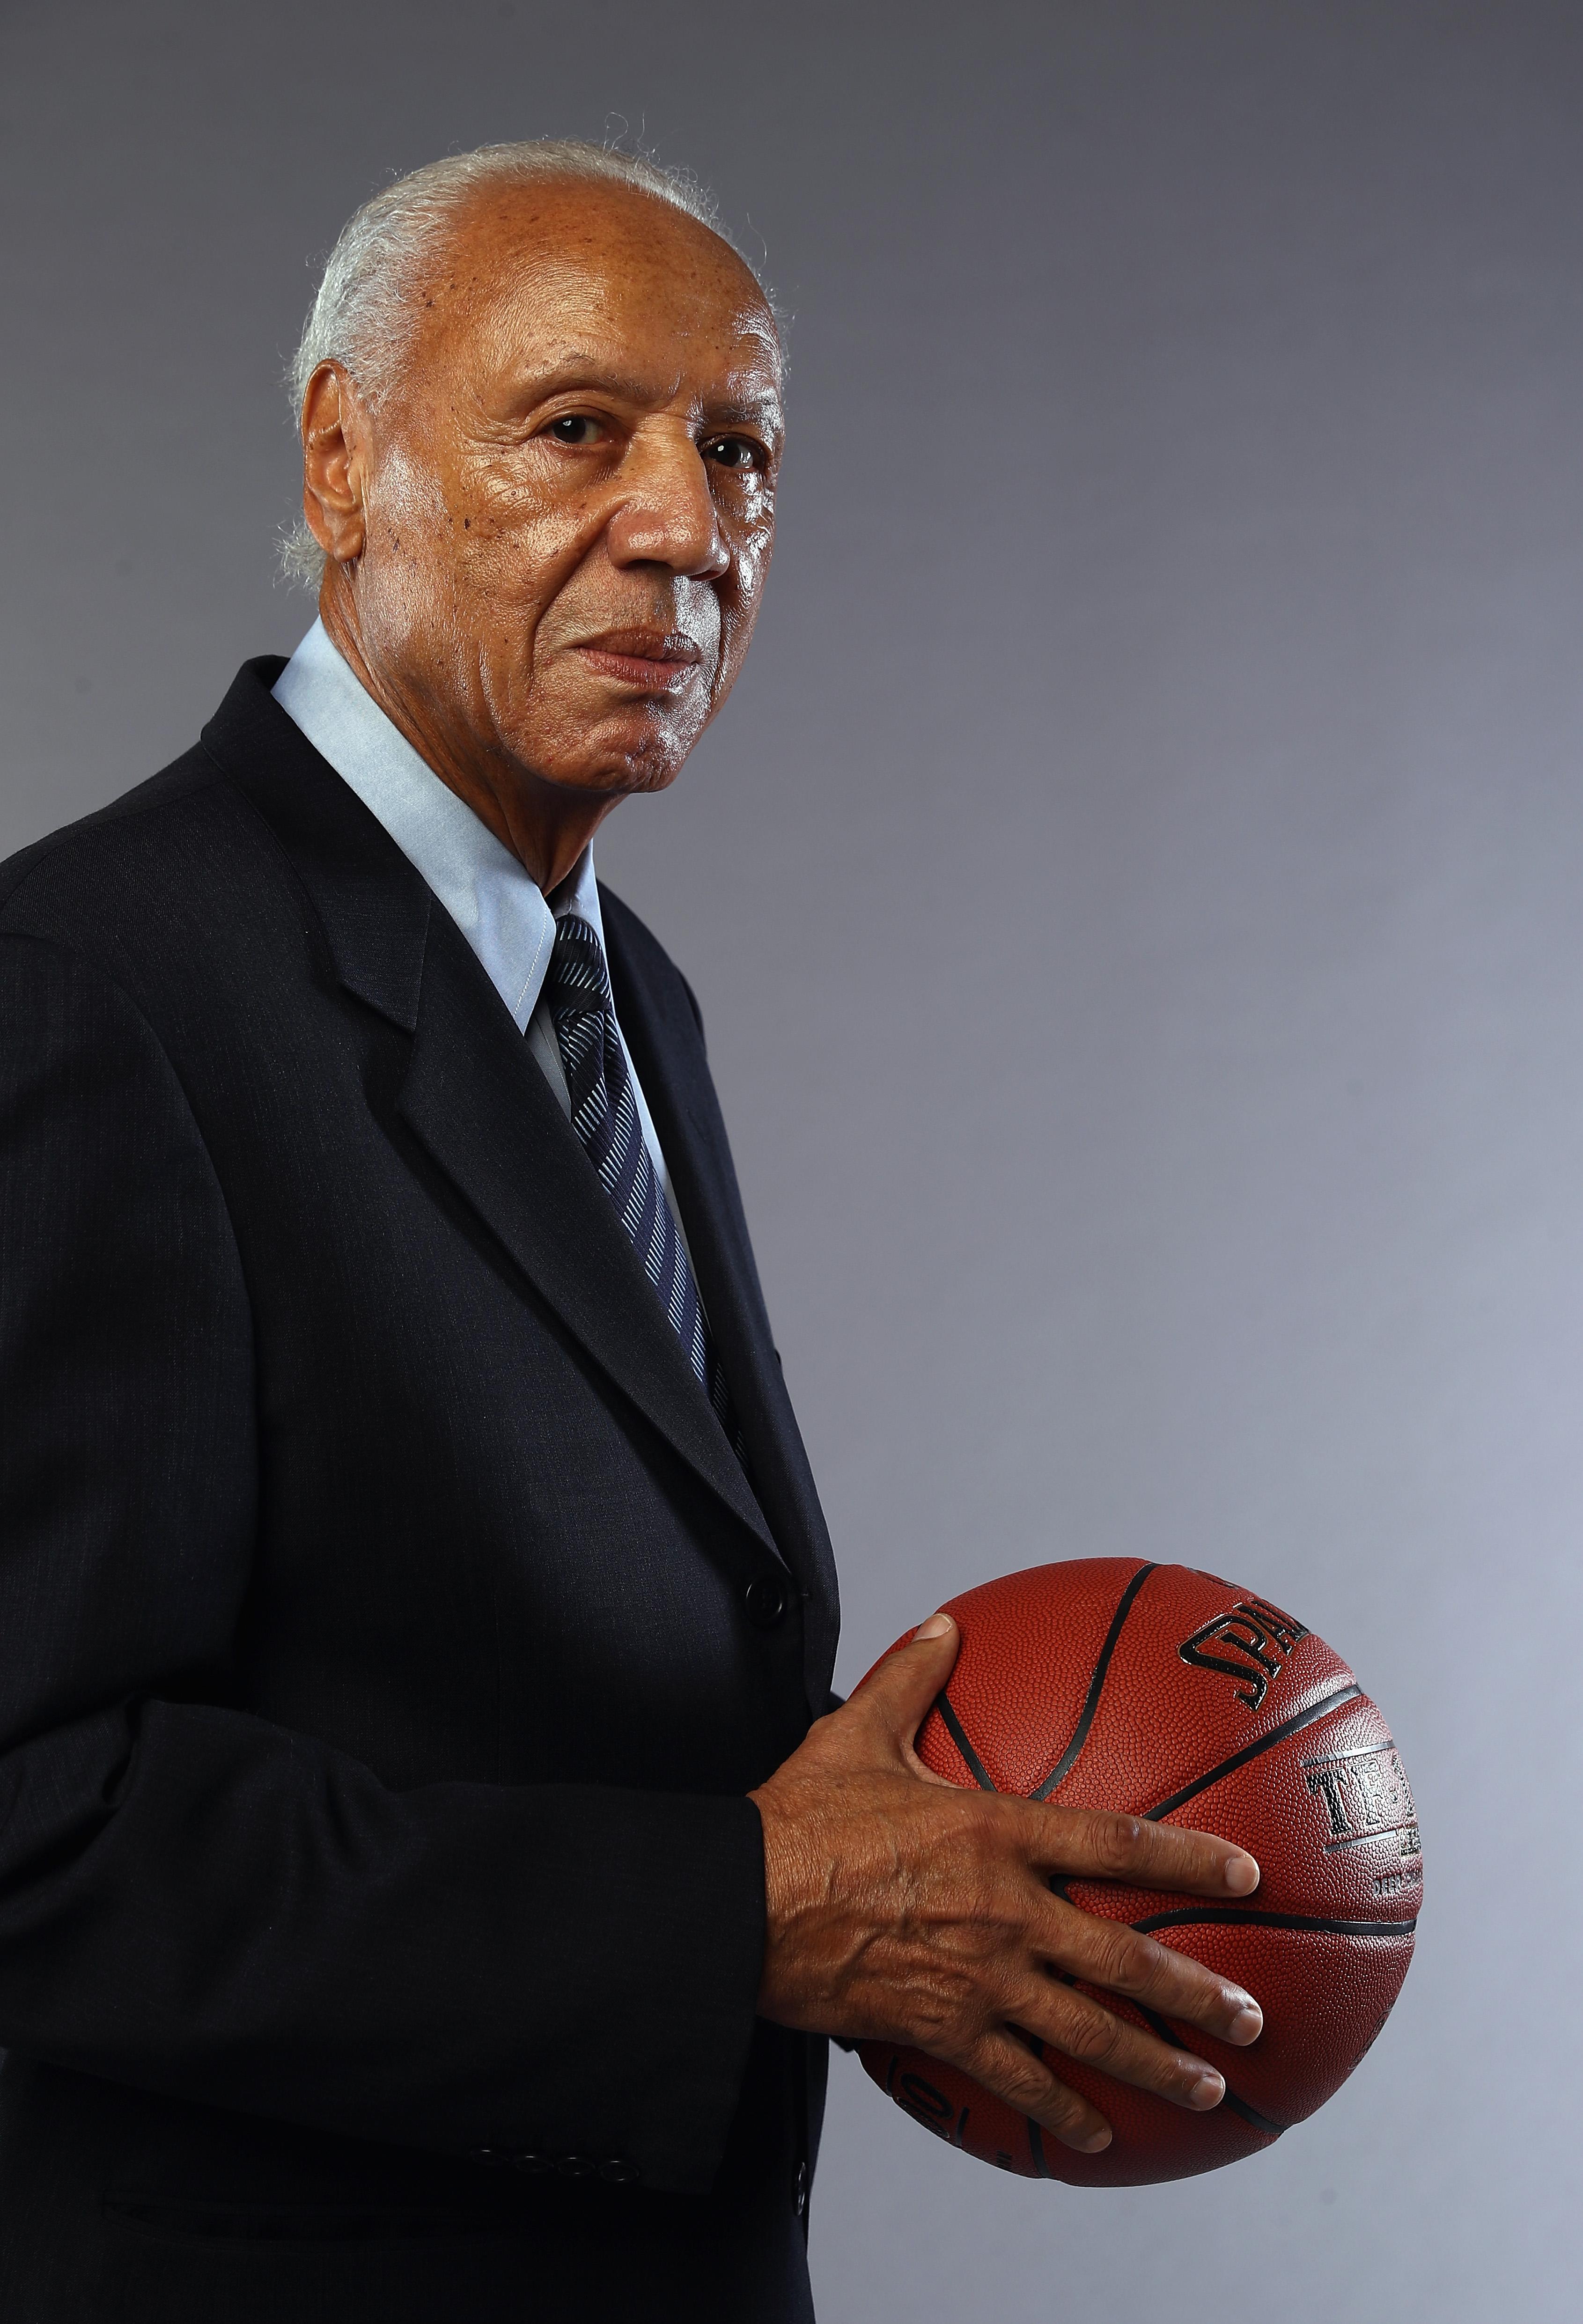 2017 Basketball Hall of Fame Enshrinement Ceremony - Portraits